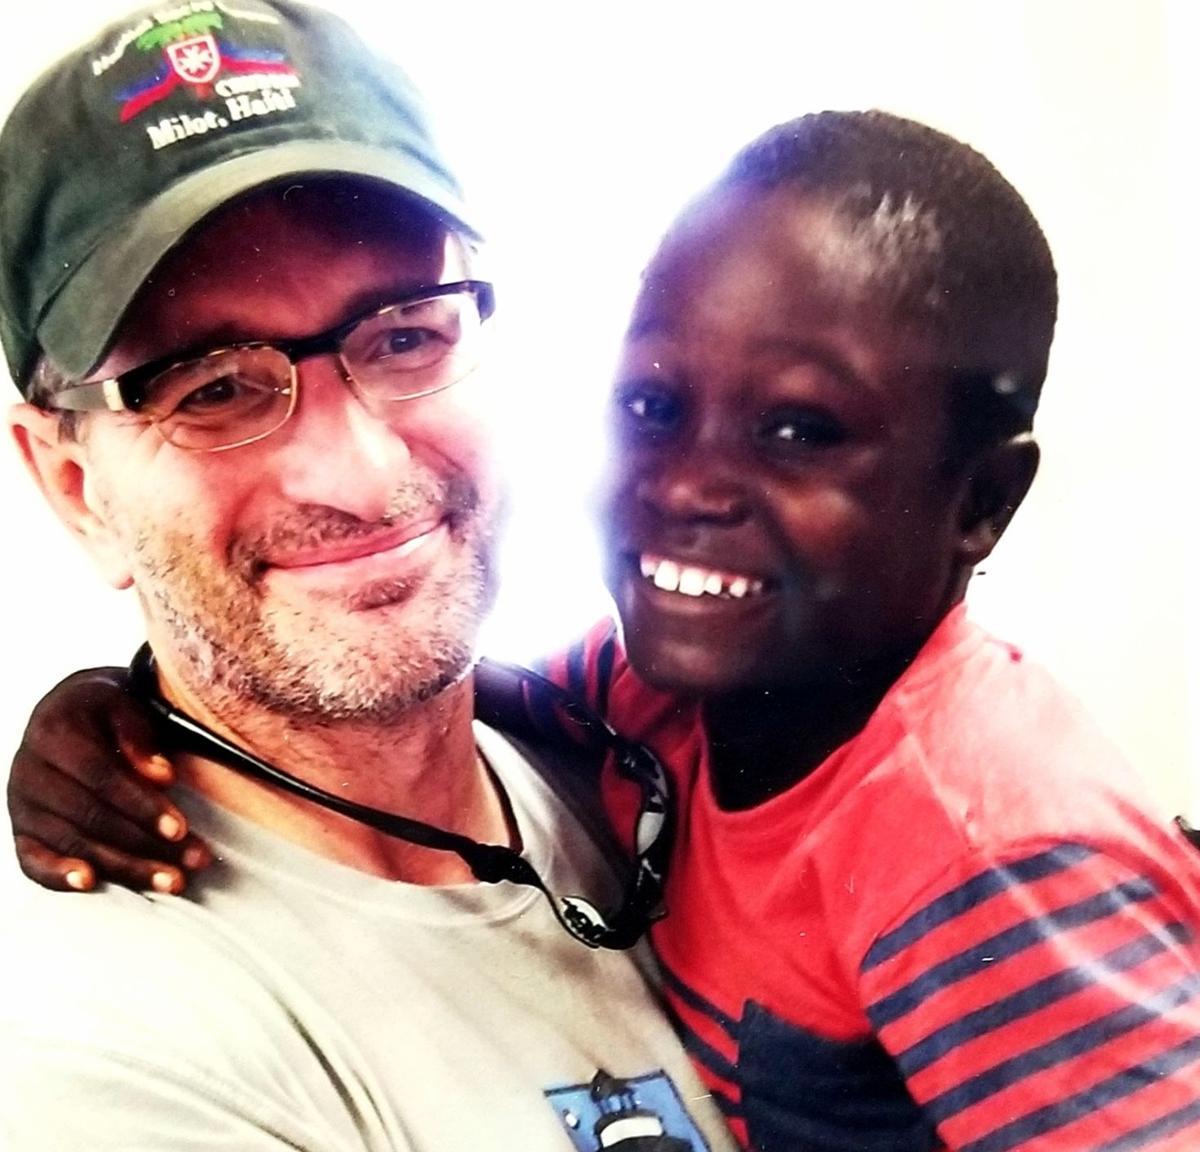 Giving back brings true joy for Dr. Jeffrey Marchessault